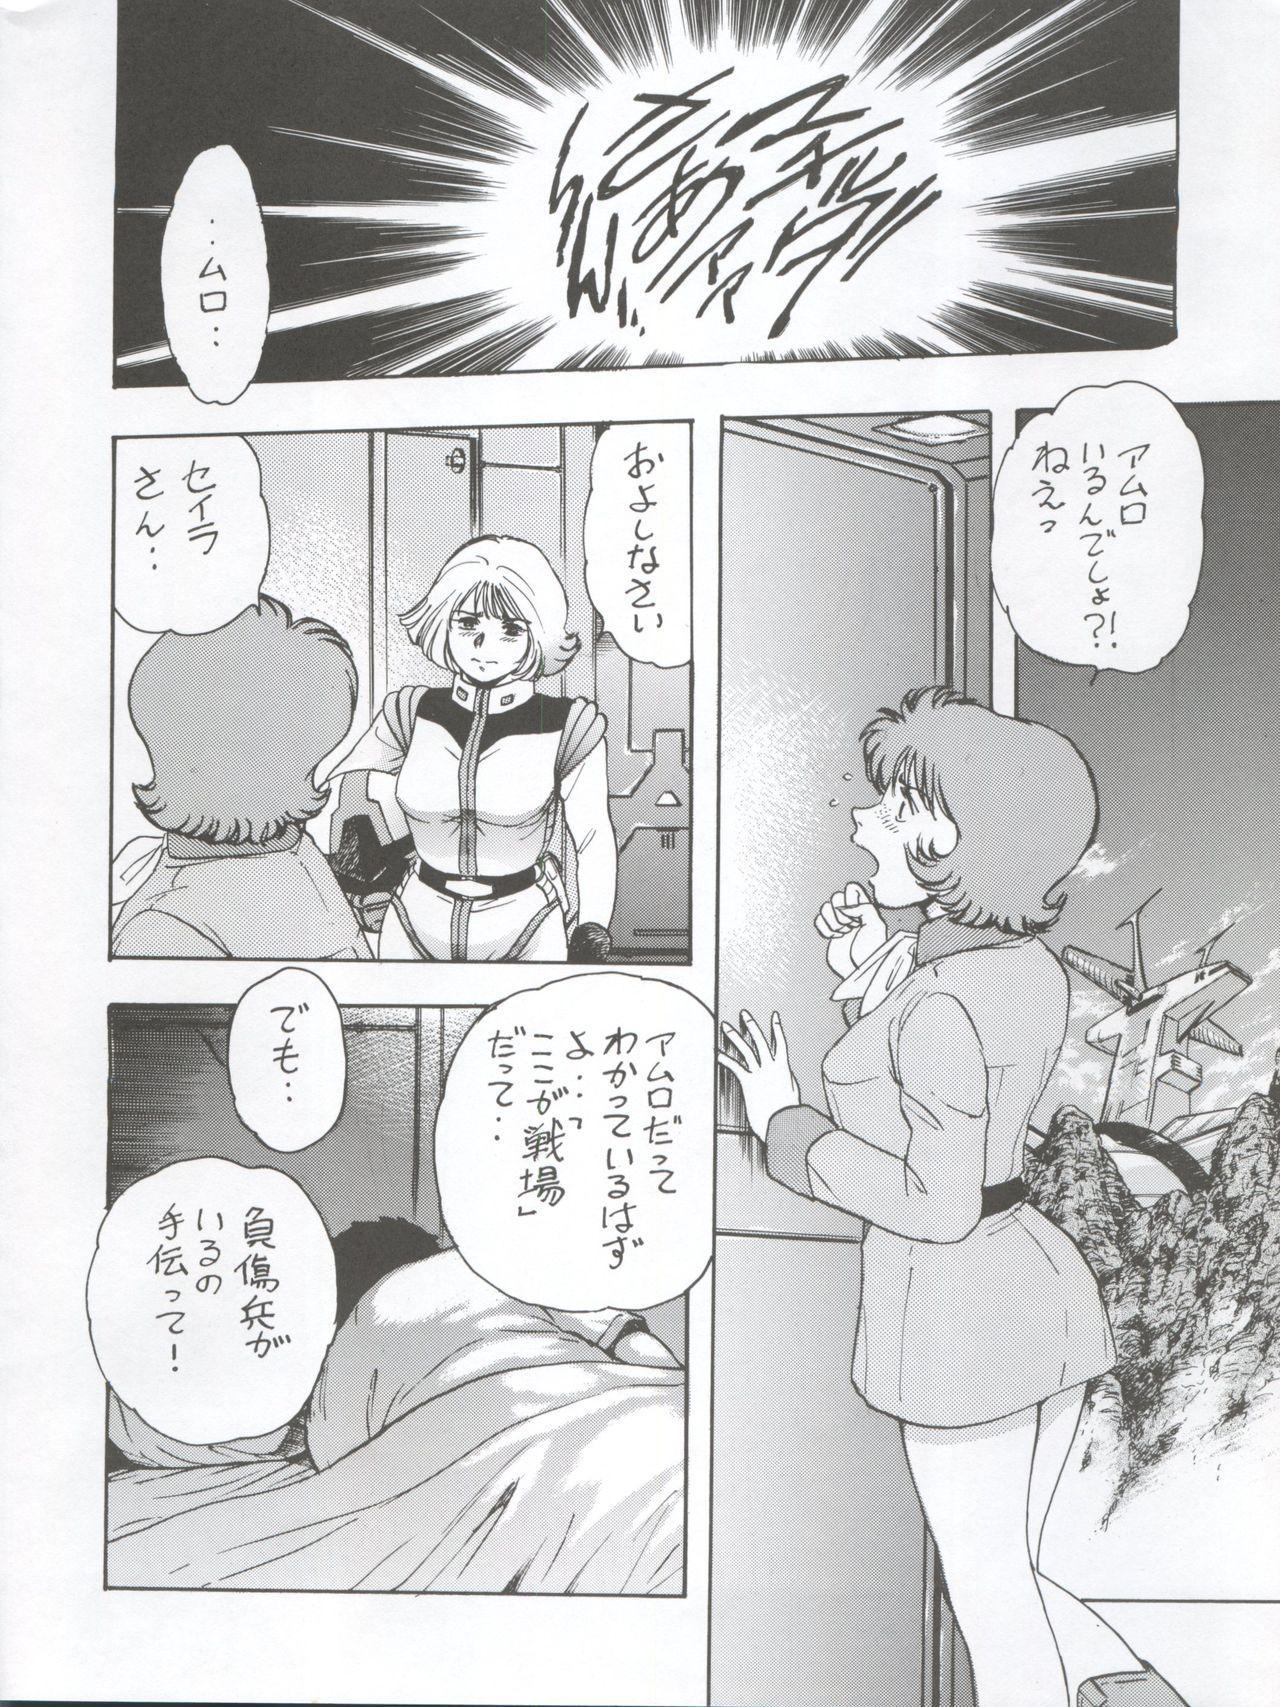 NEXT Climax Magazine 3 Gundam Series 7